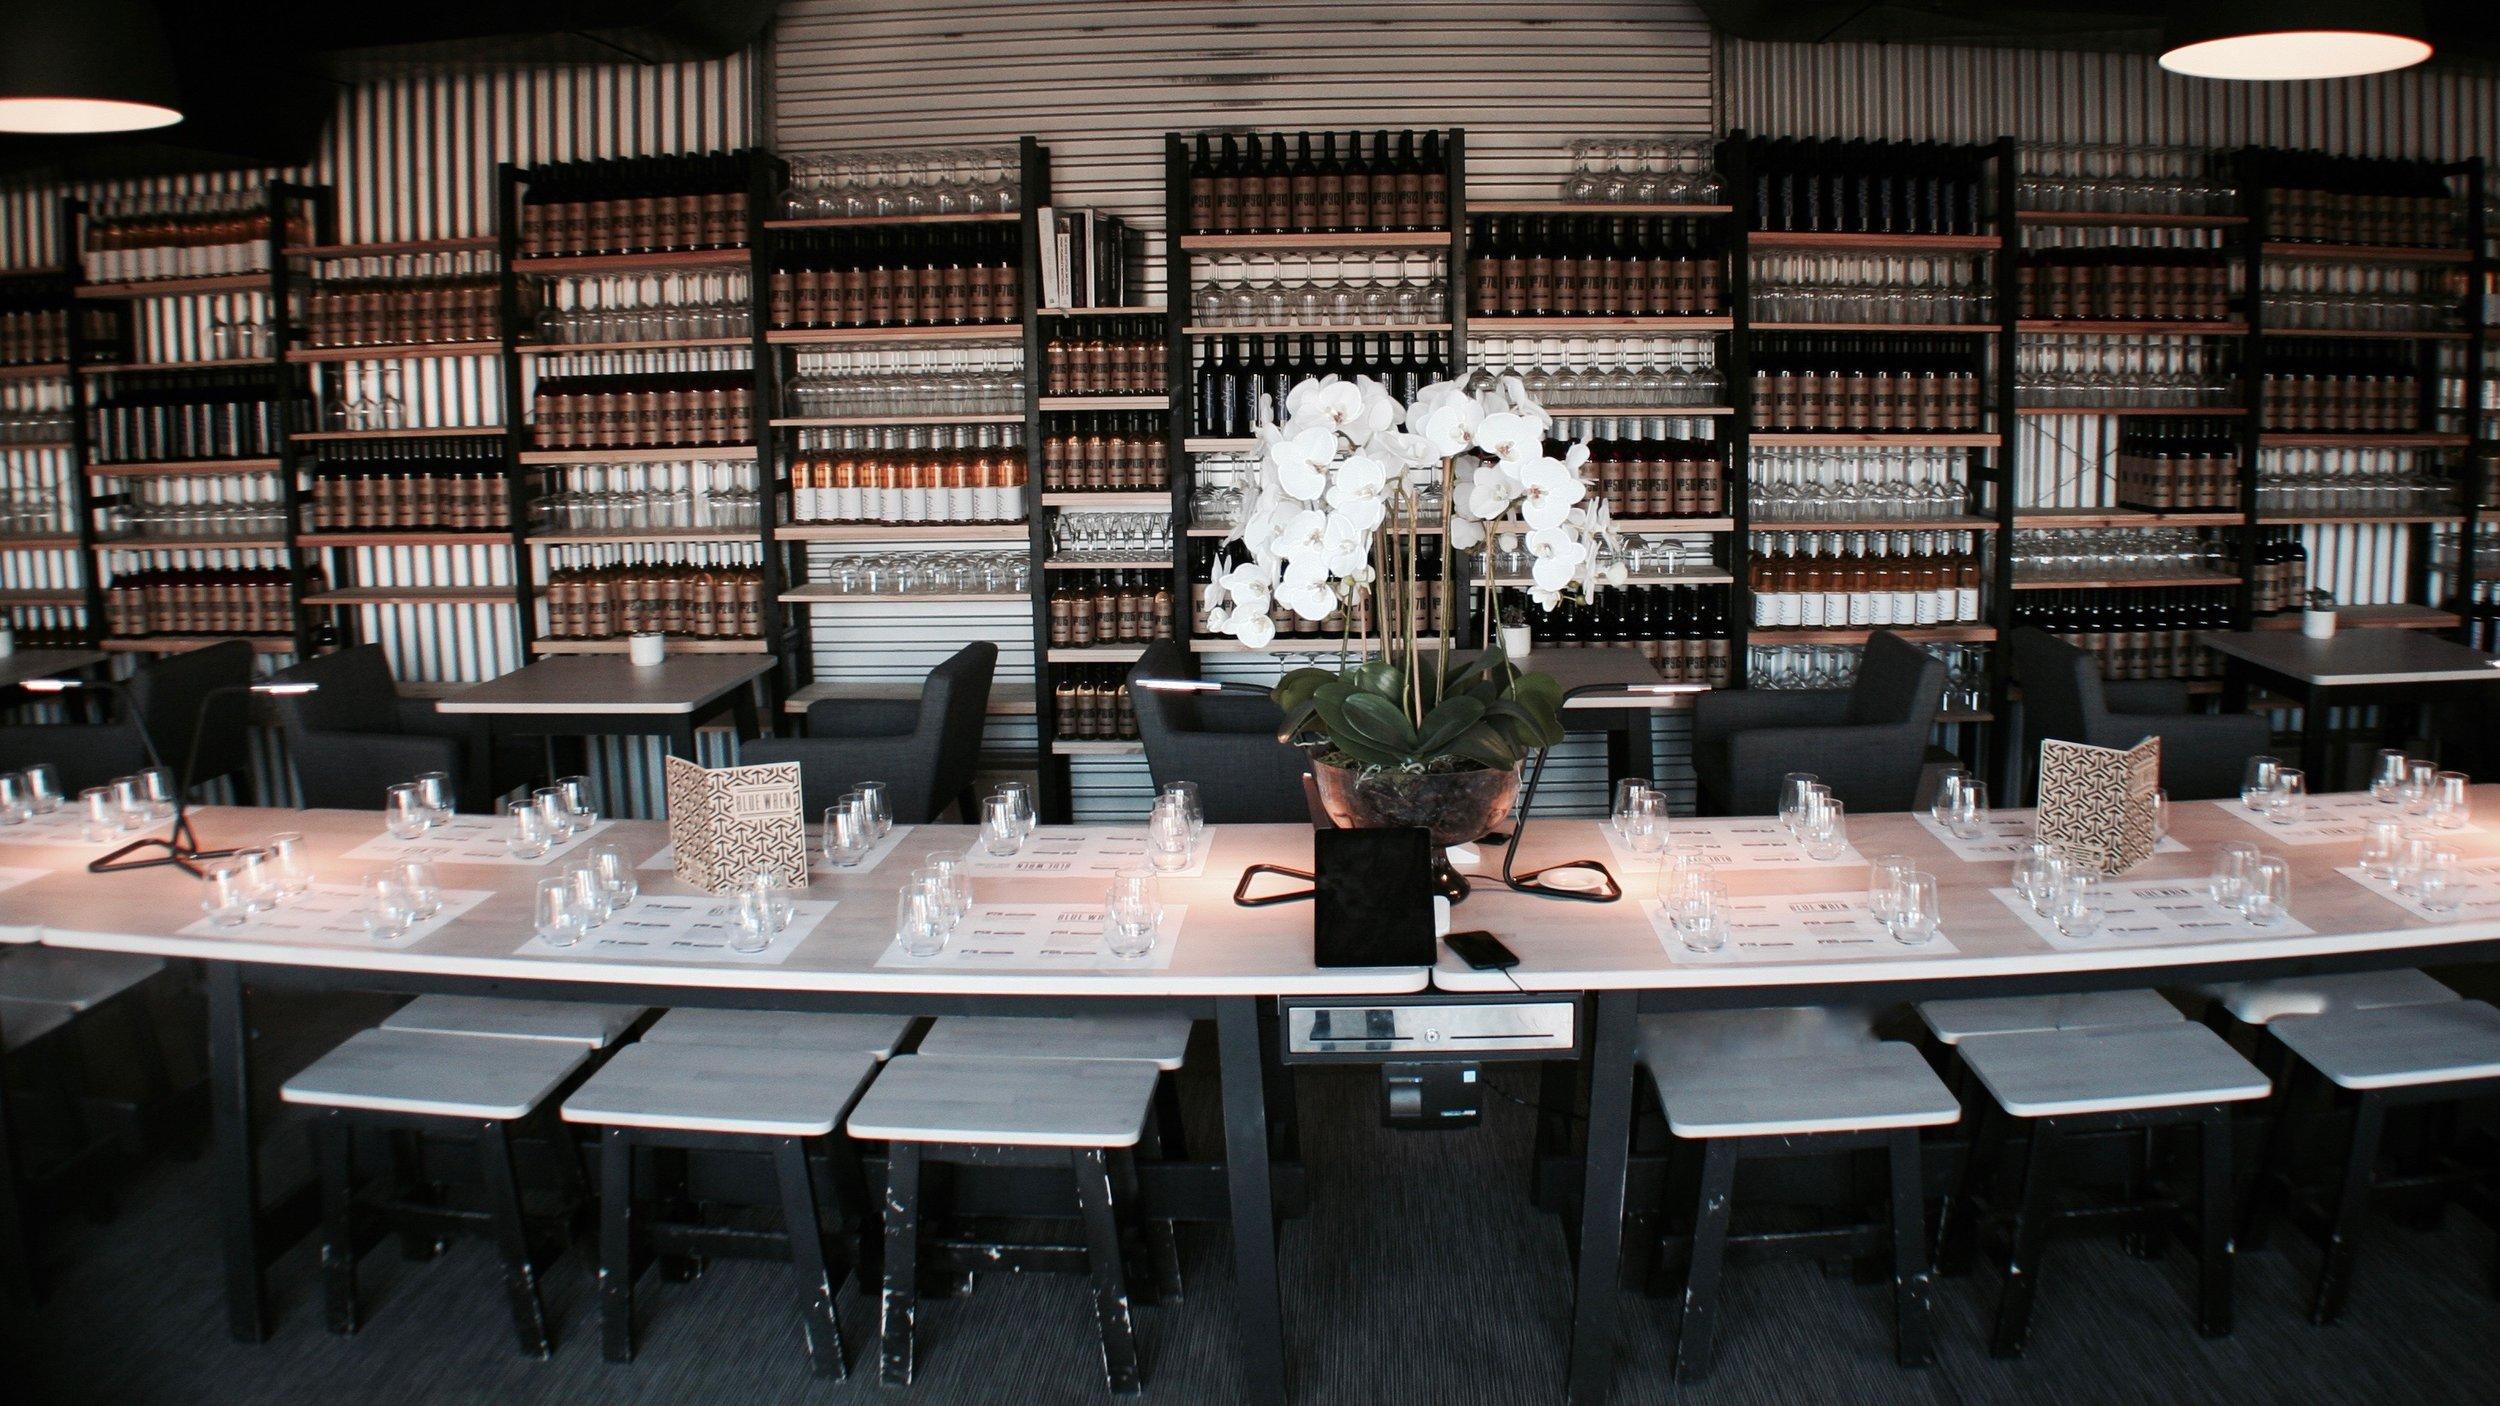 wine Tasting room in Central NSW